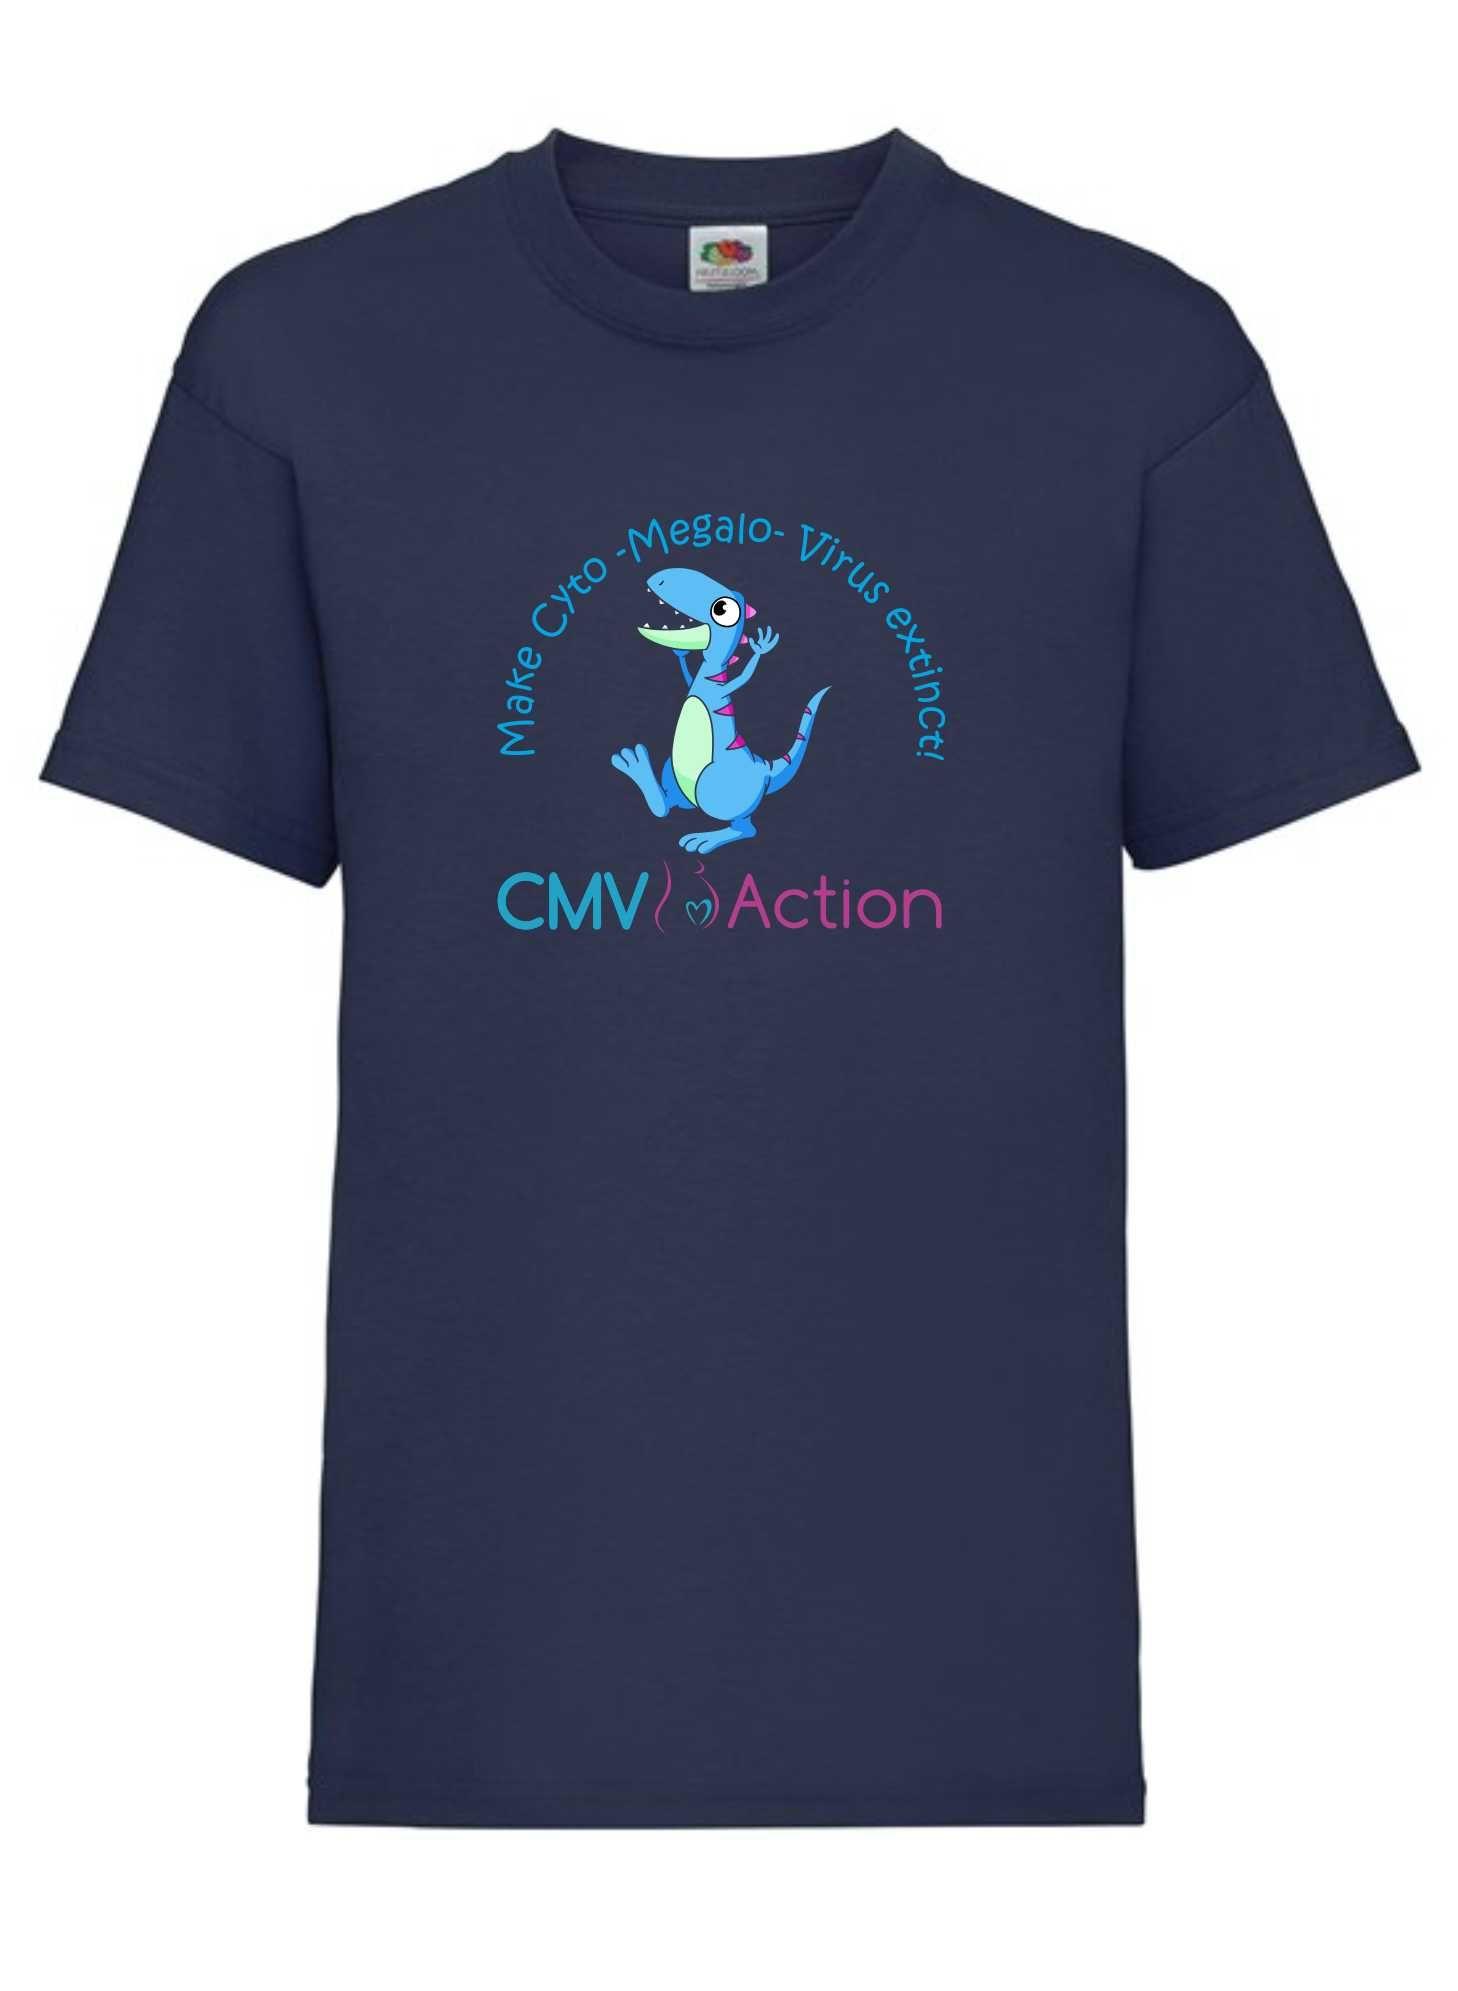 CMV- Blue Dinosaur Tee (Navy) (Kids)